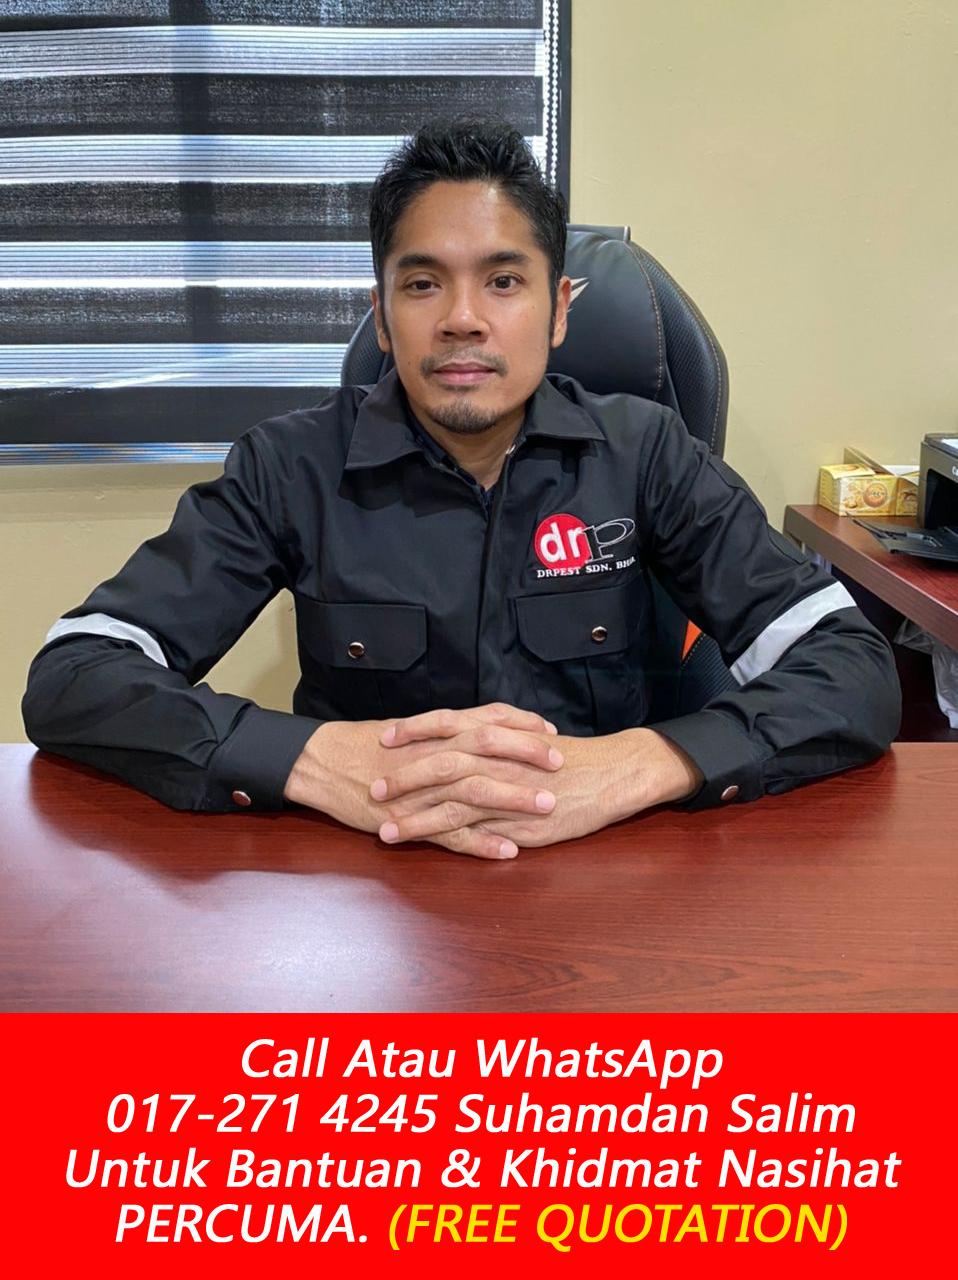 drpest sdn bhd drp maintenance and services syarikat kawalan serangga bumiputra yang berlesen the best company pest control near me area Chow Kit kl near me